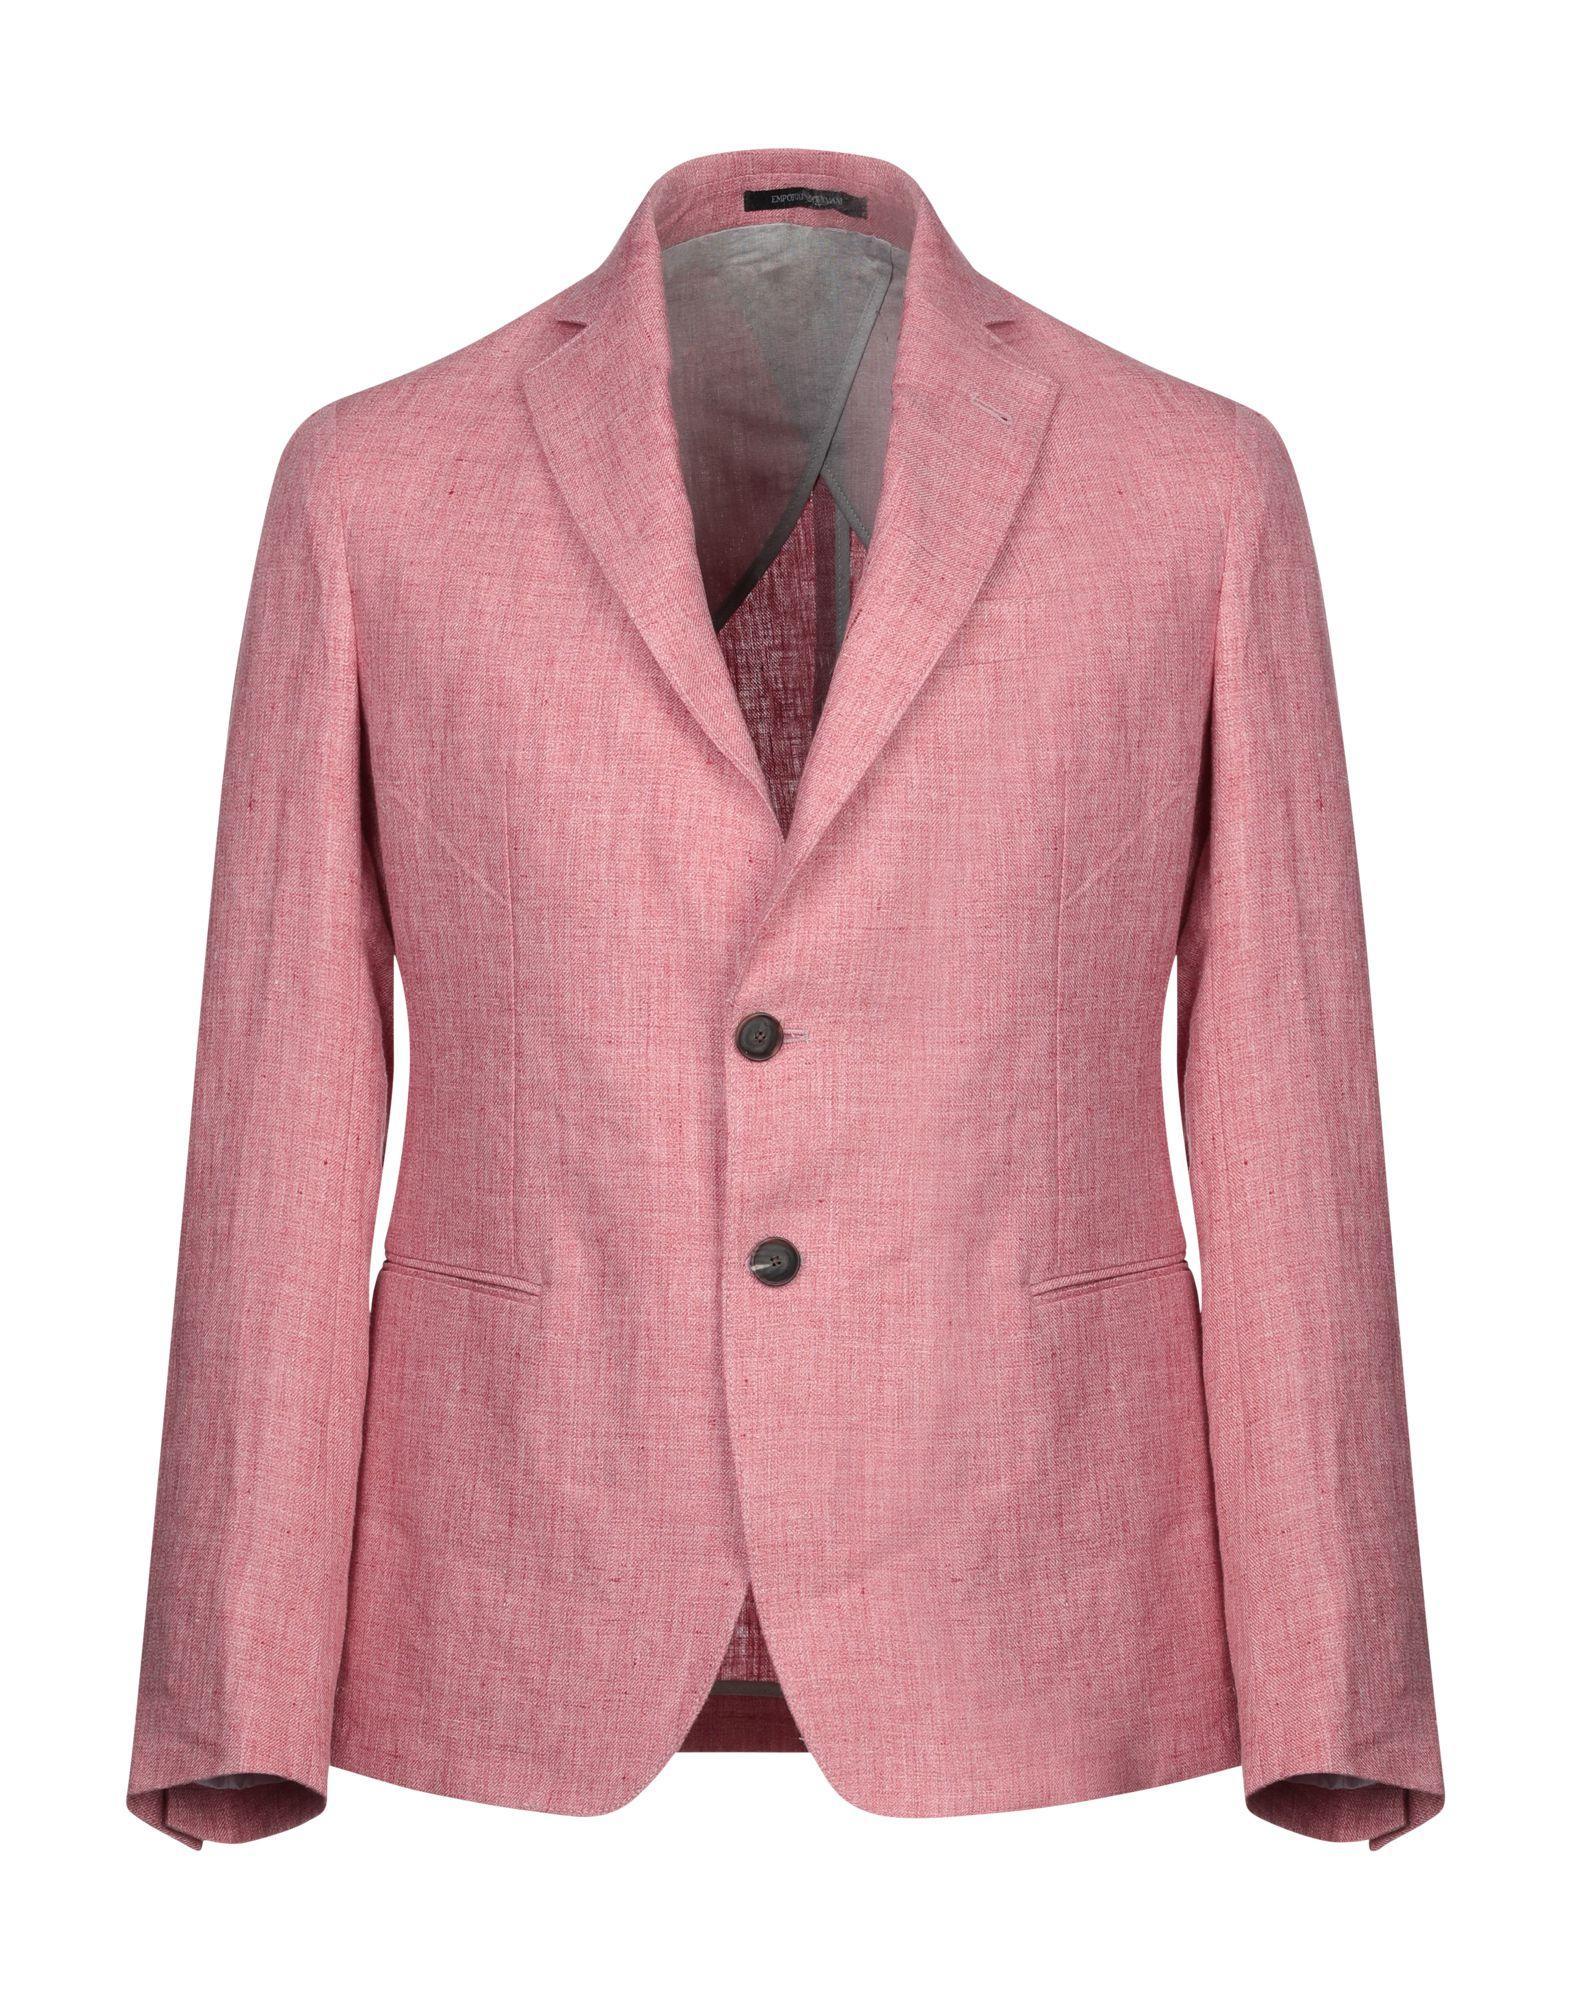 b8404001629dc Lyst - Emporio Armani Blazer in Pink for Men